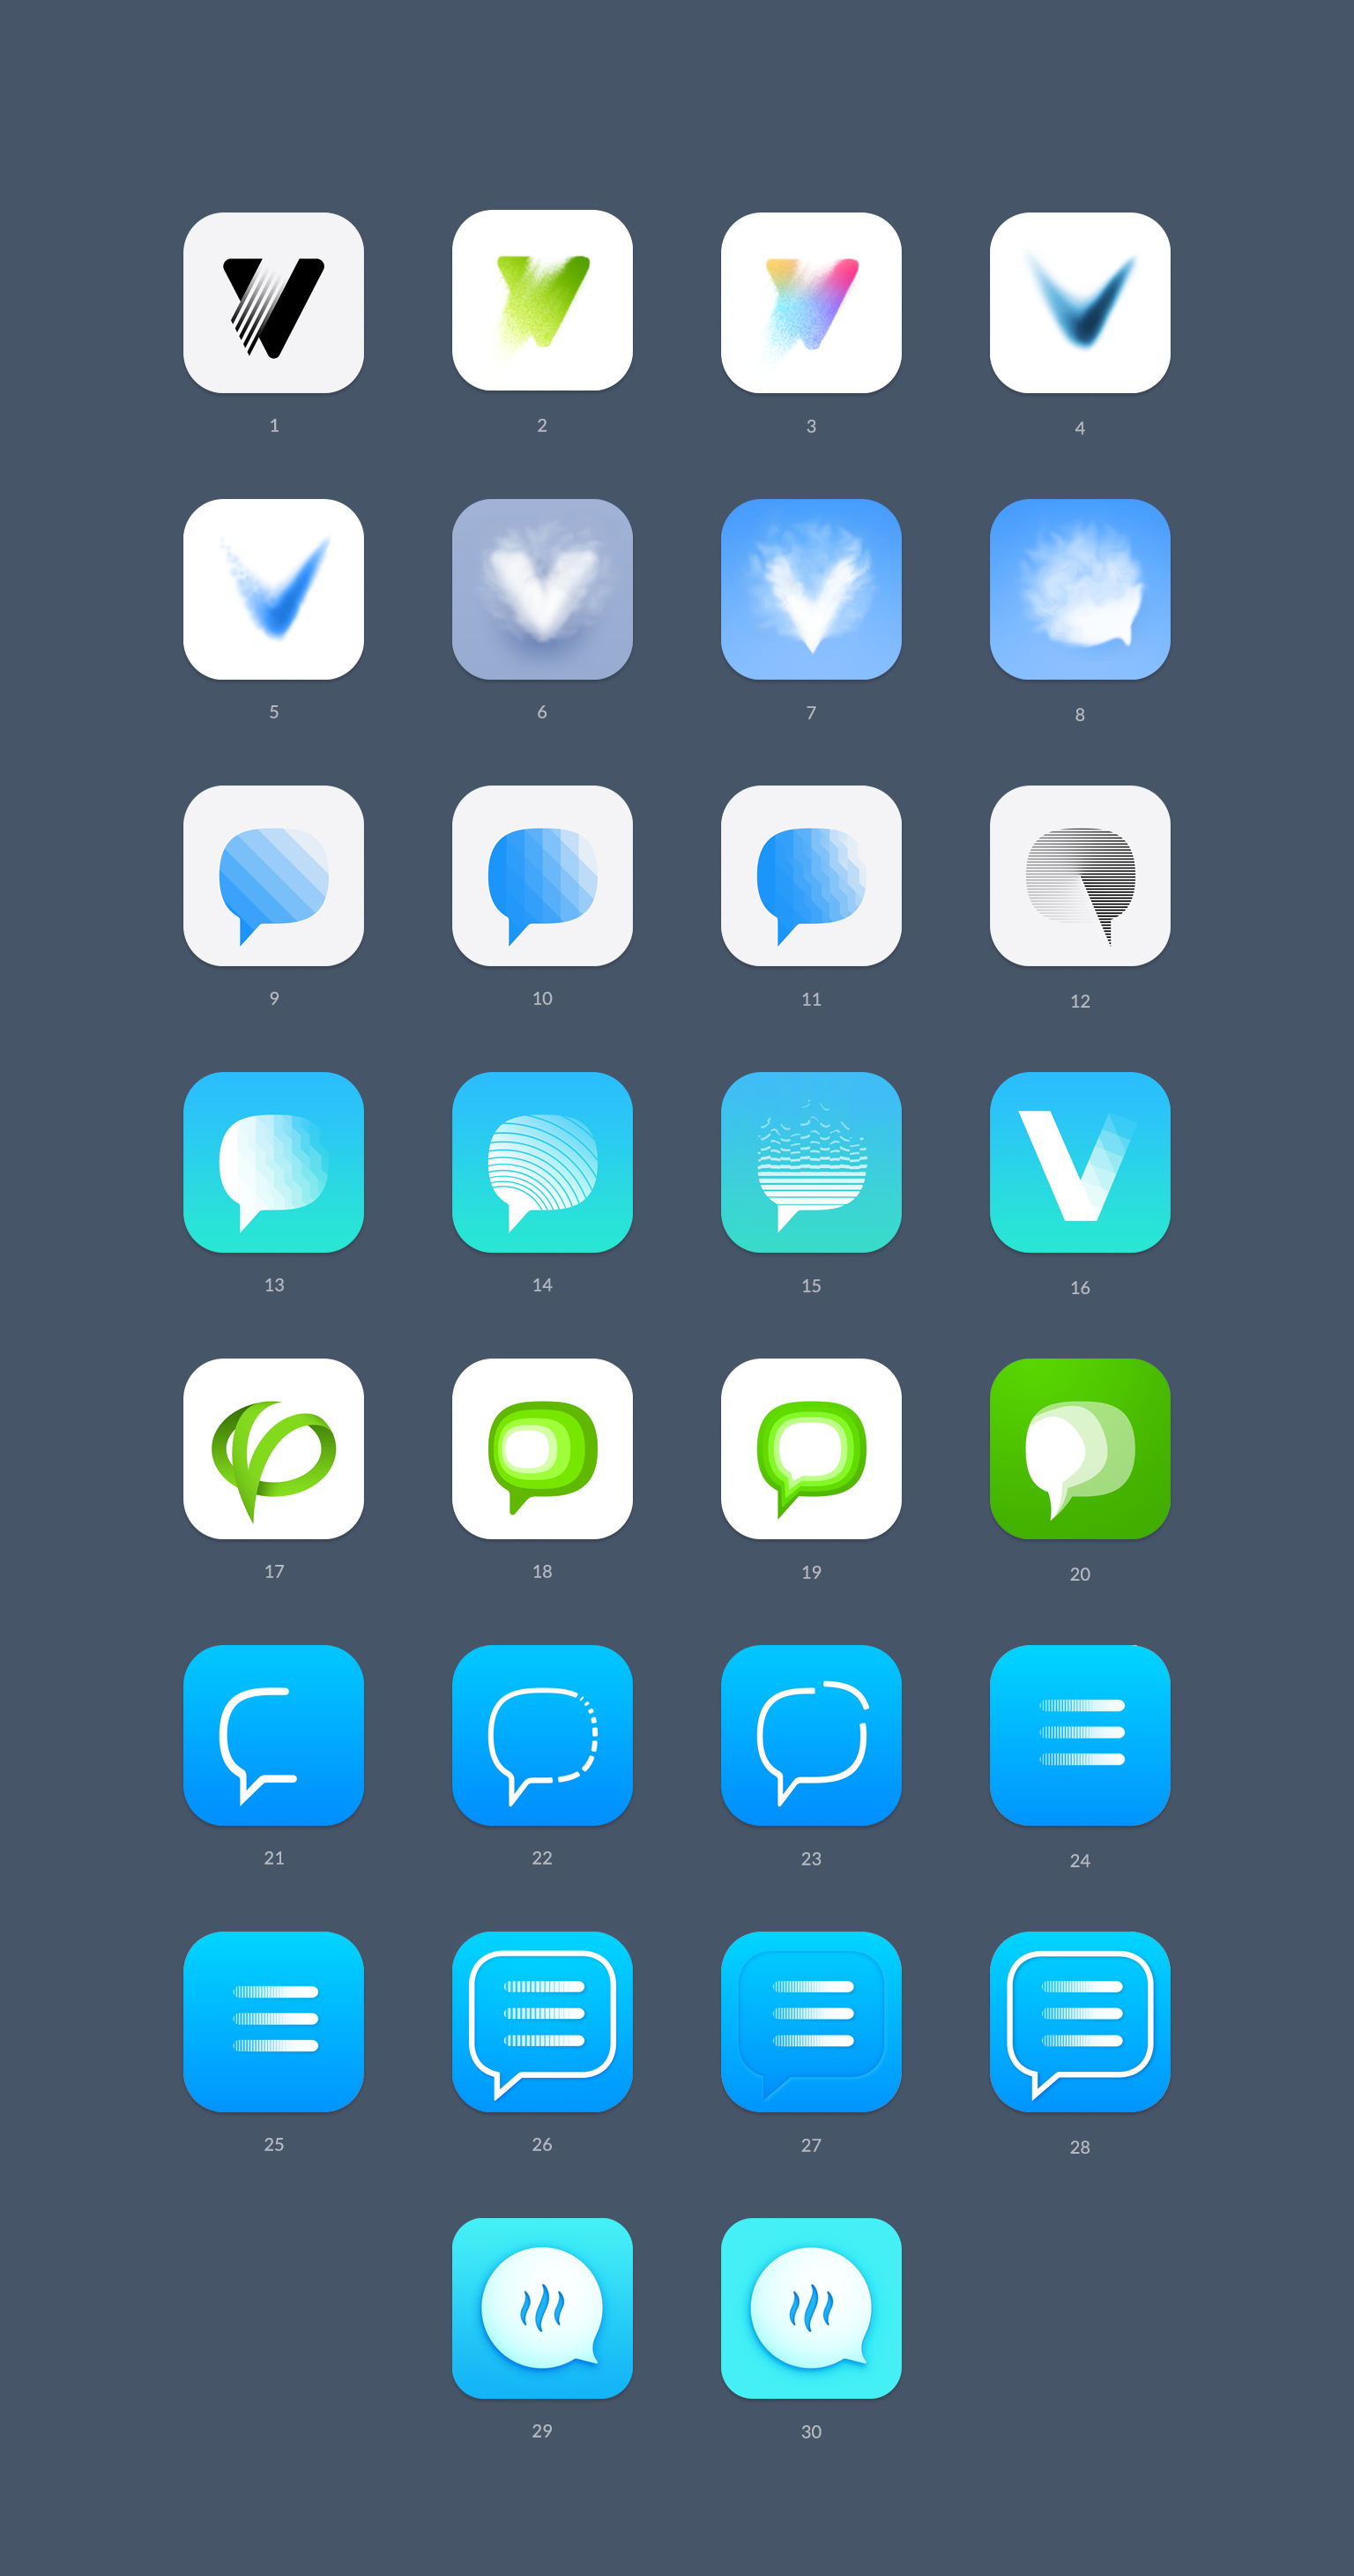 Dribbble social app ui design jpg by ramotion - Process Flat News App Icon Design Ramotion